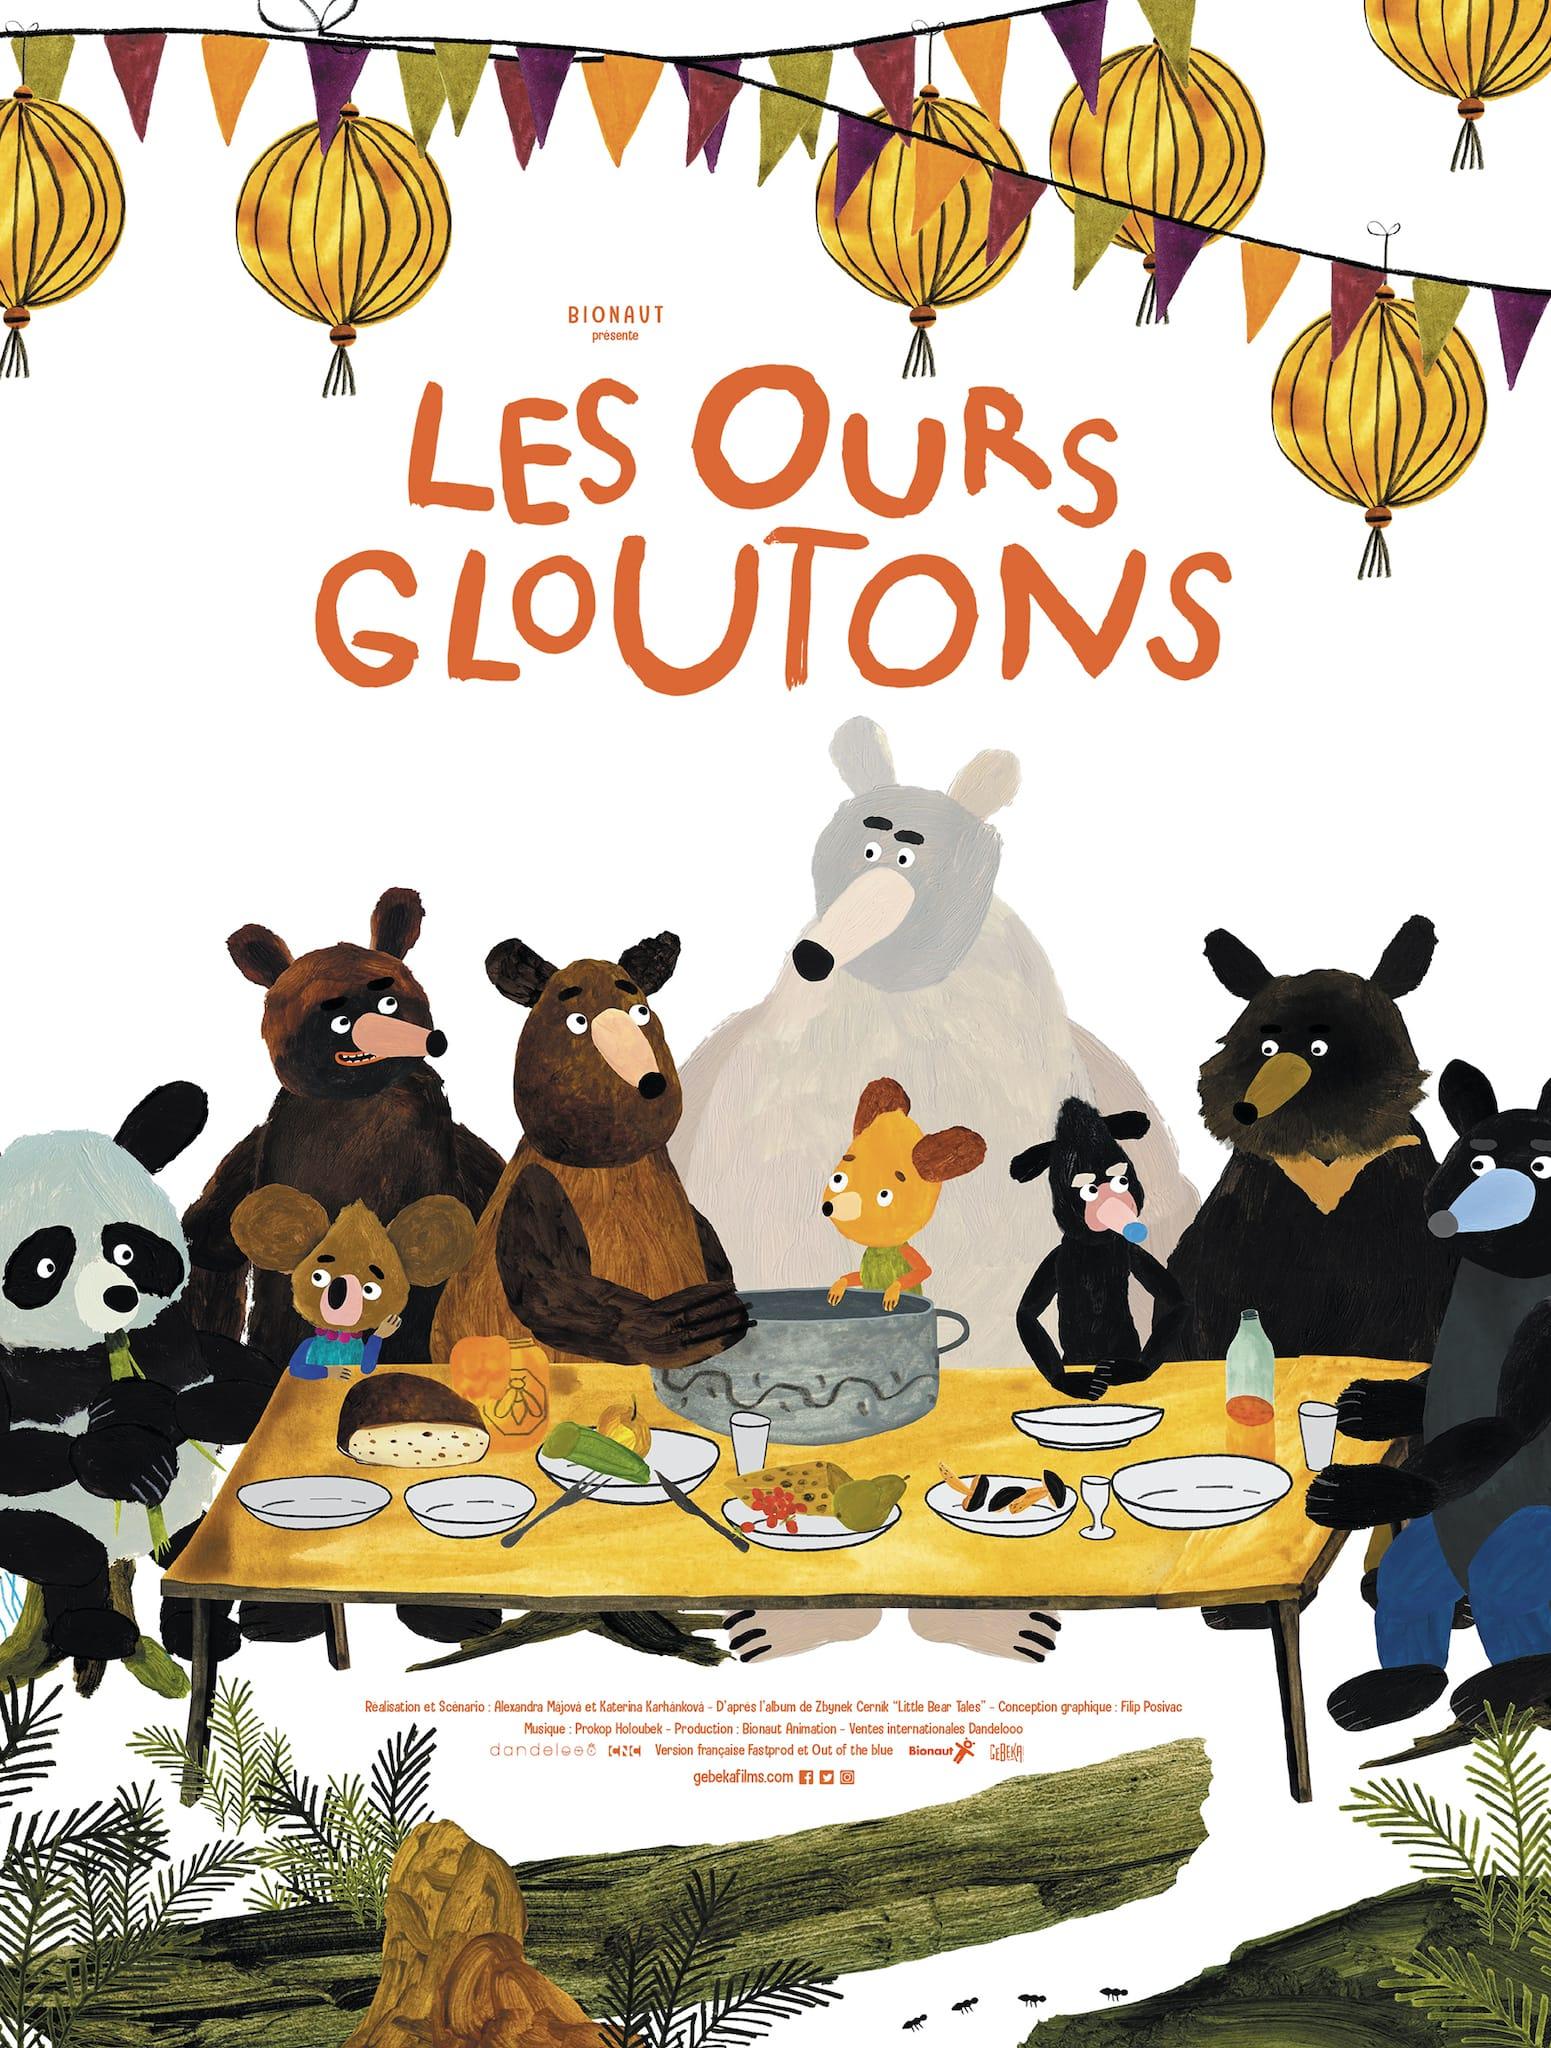 Les Ours gloutons d'Alexandra Hetmerová et Kateřina Karhánková affiche animation